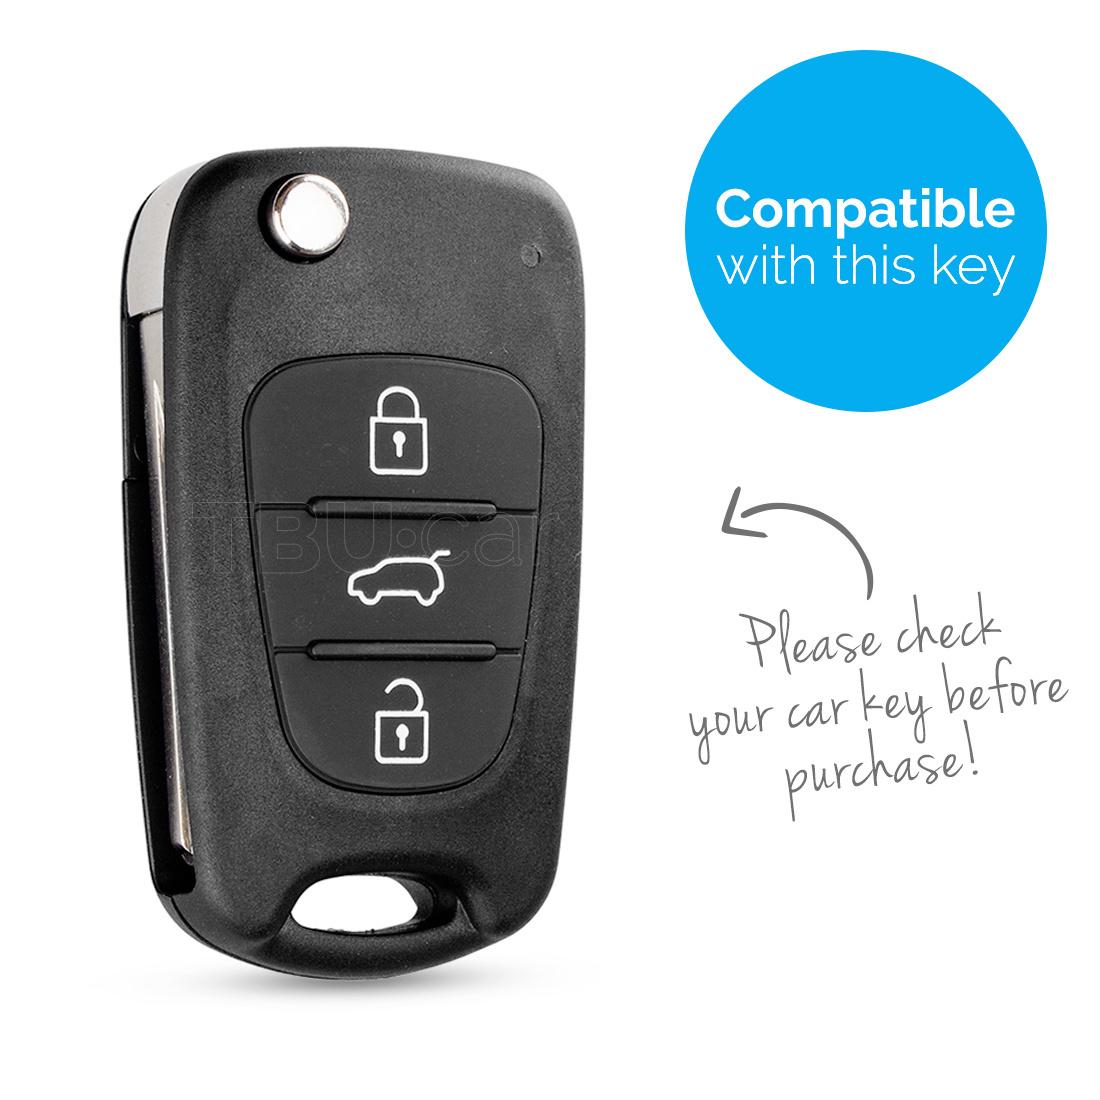 TBU car TBU car Autoschlüssel Hülle kompatibel mit Hyundai 3 Tasten - Schutzhülle aus Silikon - Auto Schlüsselhülle Cover in Rot